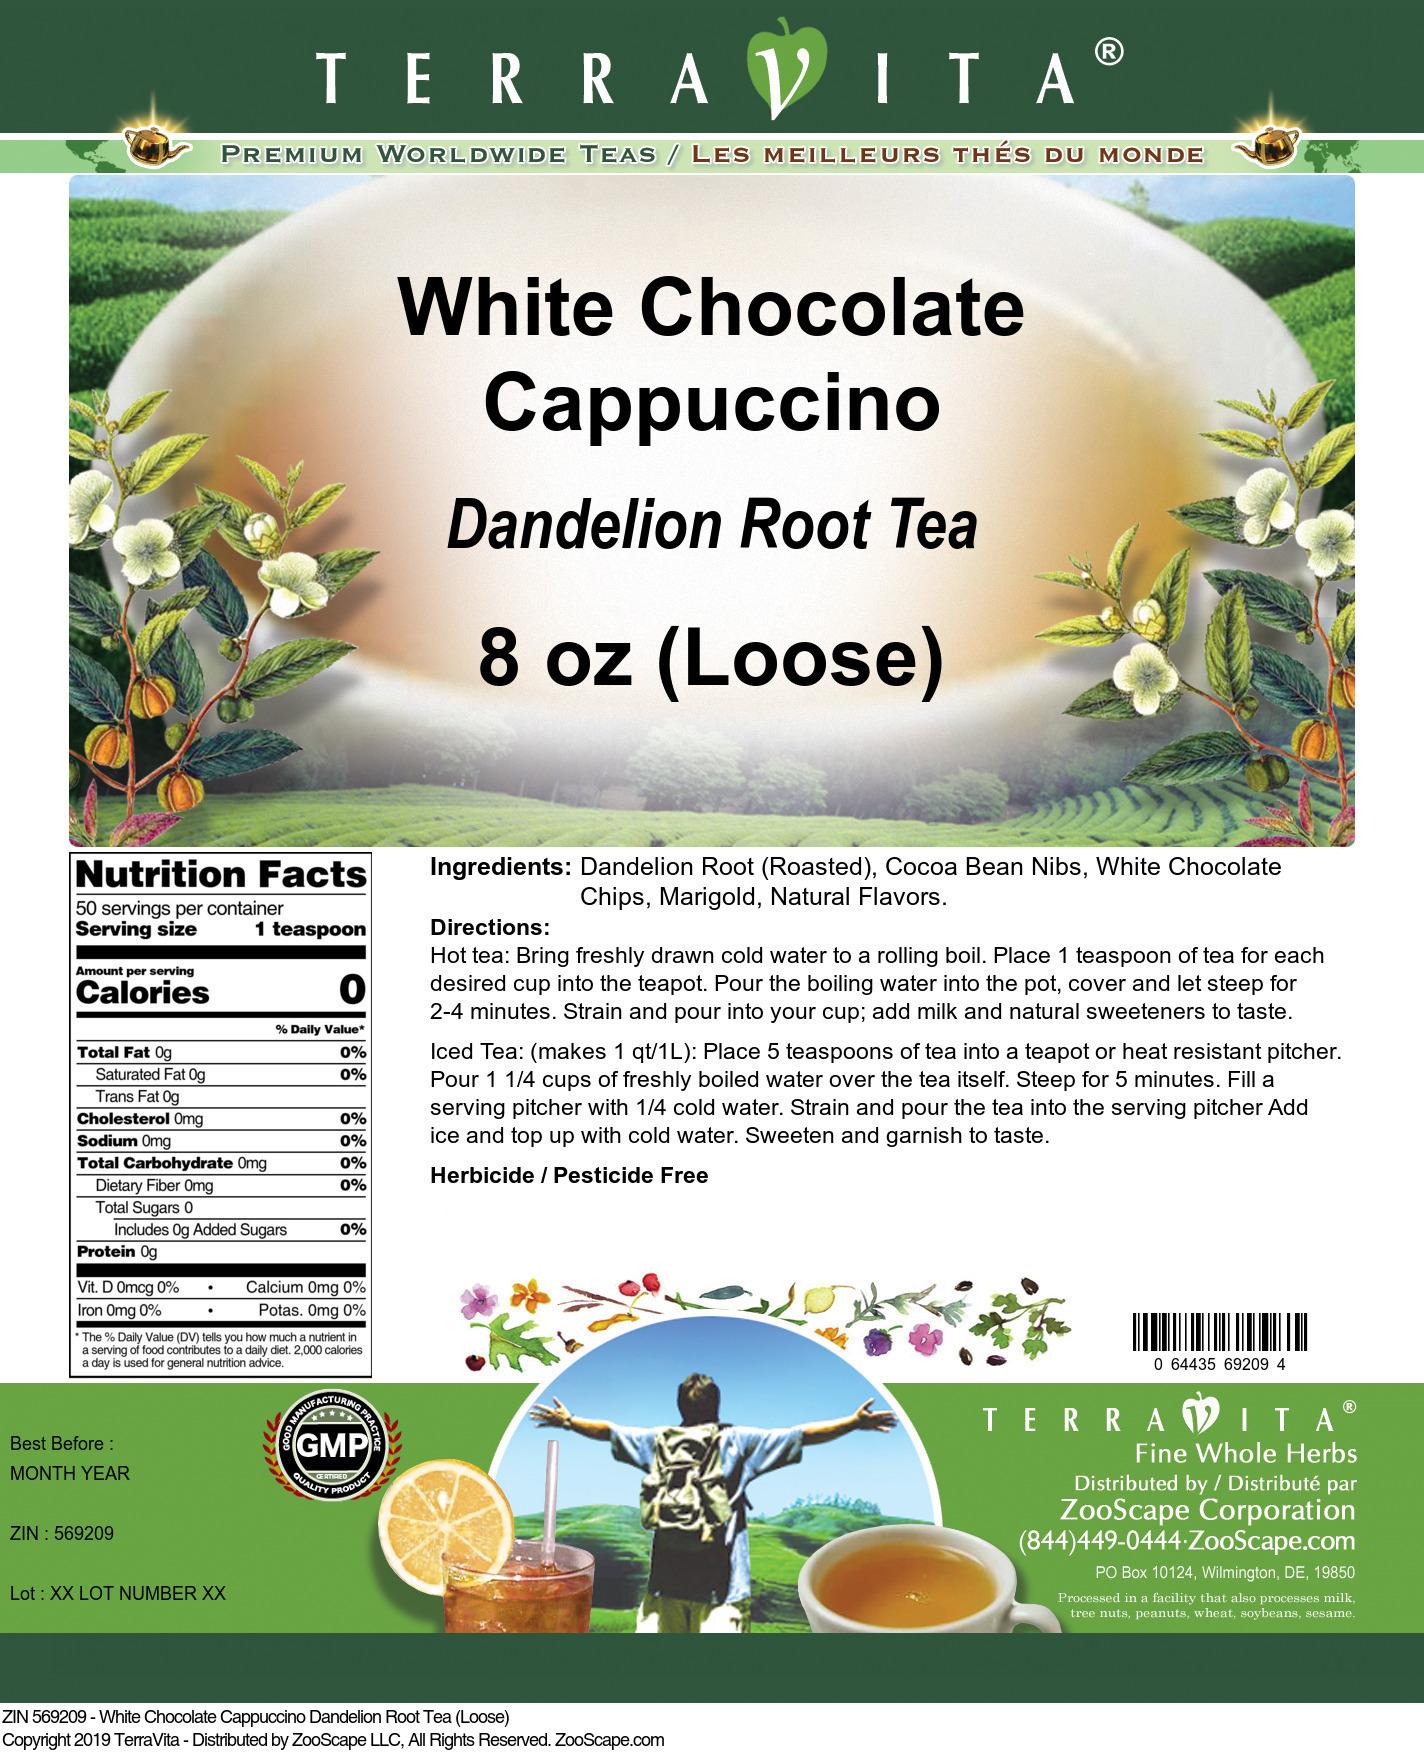 White Chocolate Cappuccino Dandelion Root Tea (Loose)